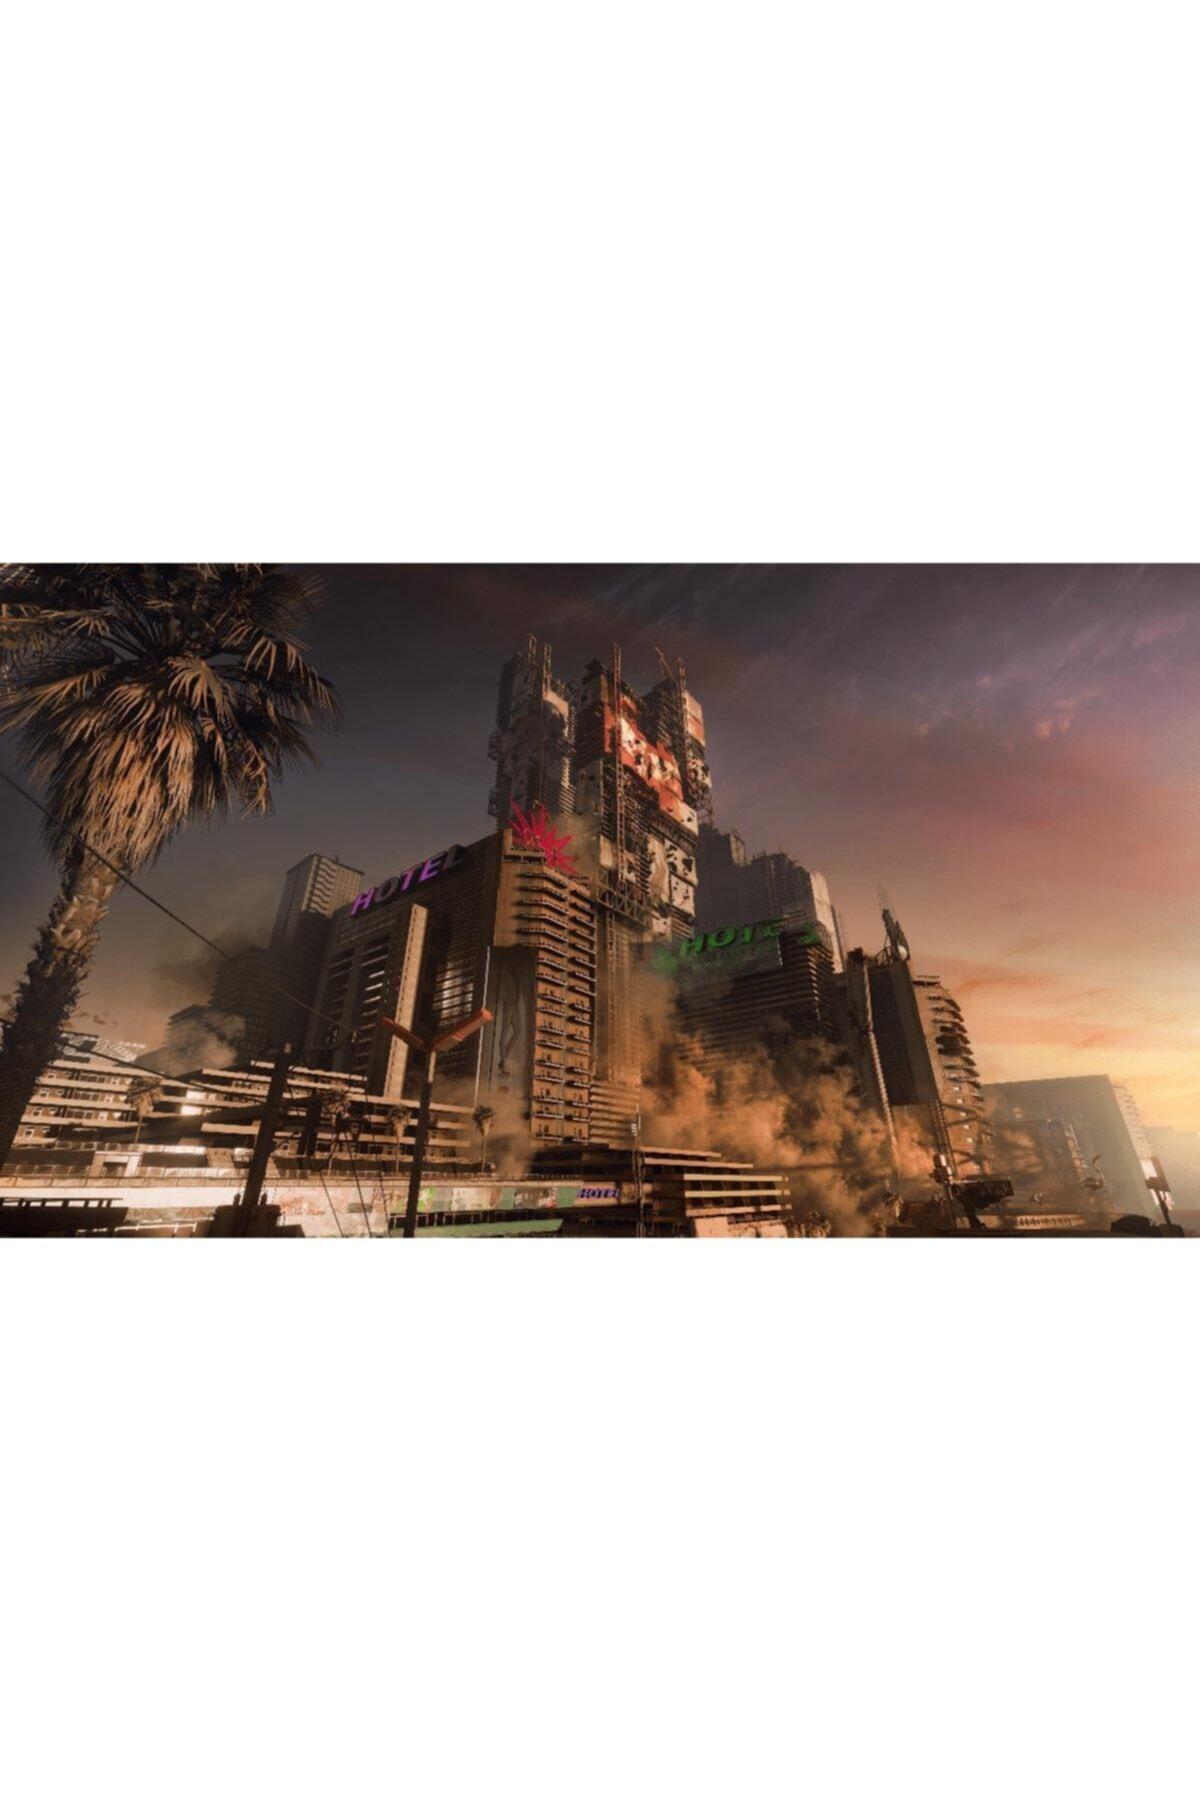 CD Projekt Red Cyberpunk 2077 Standart Edition Xbox One 2